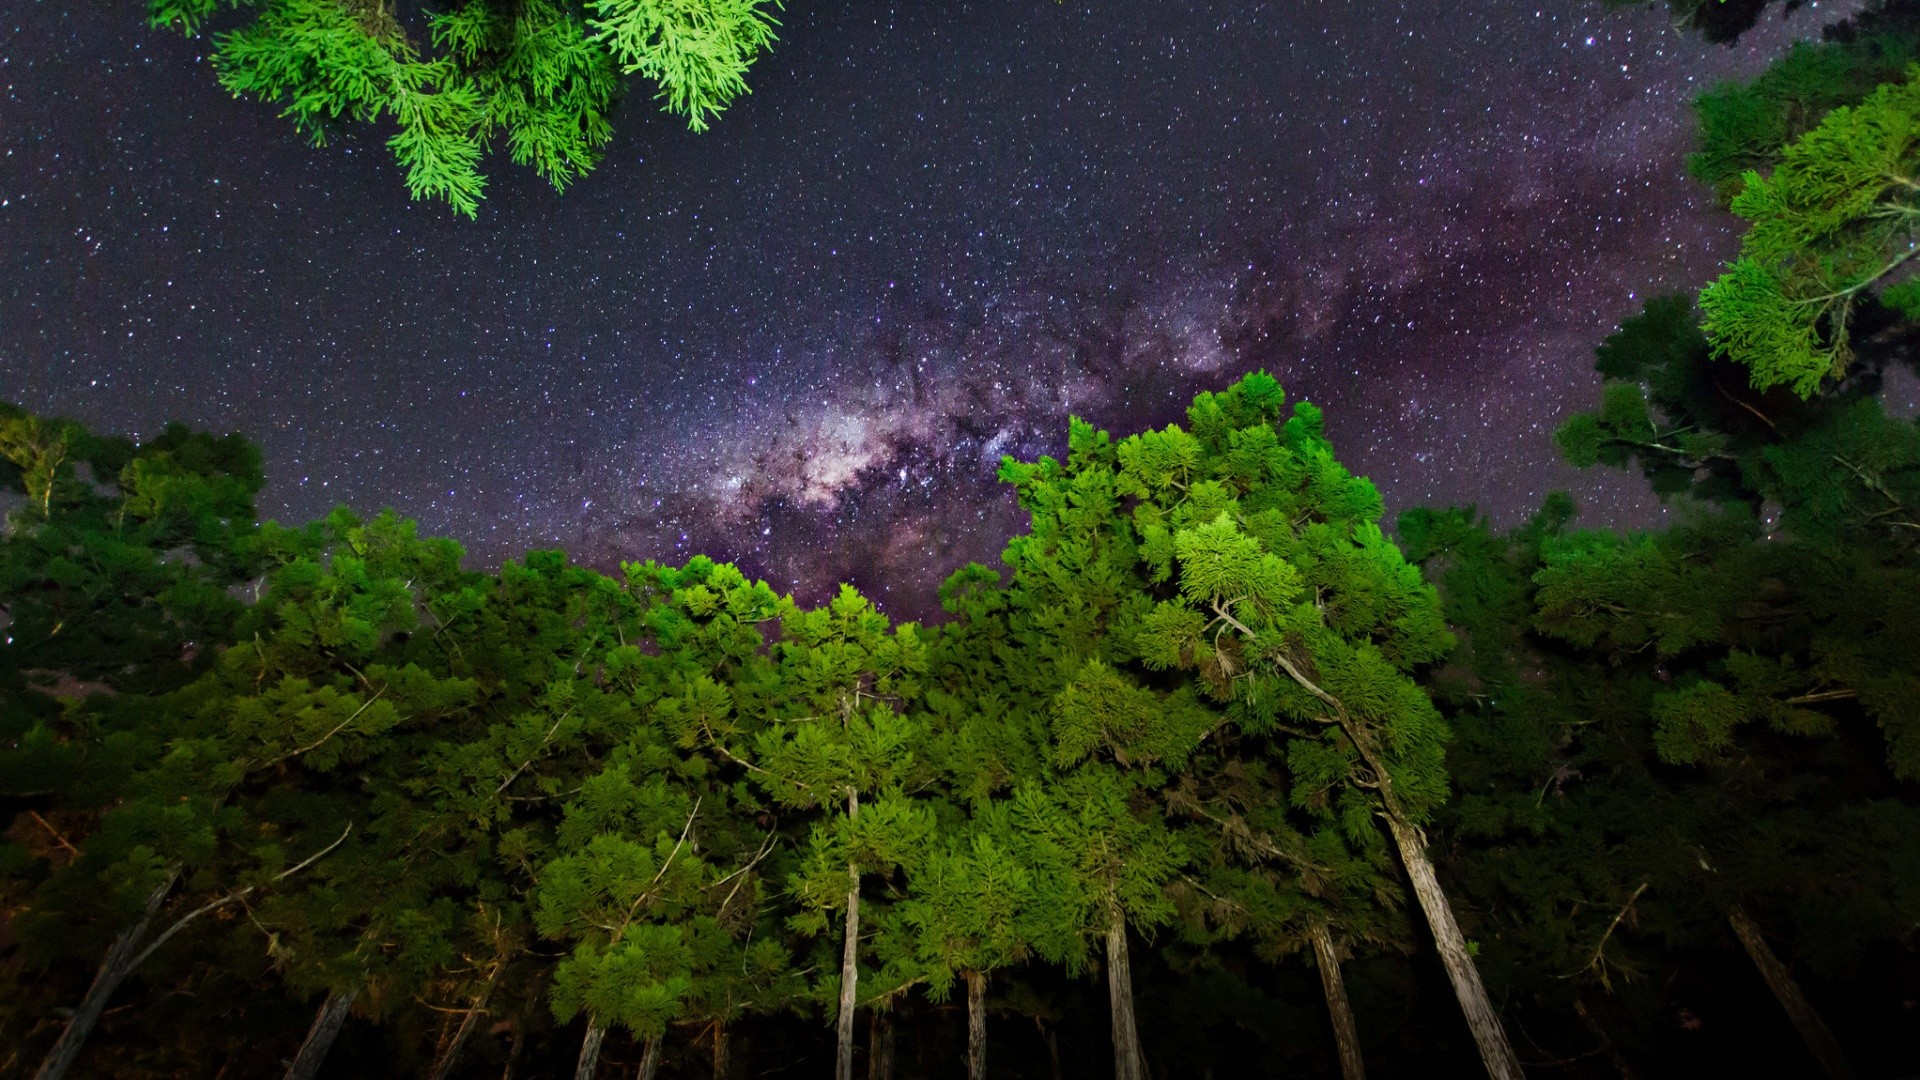 Grass Green Trees Milky Way